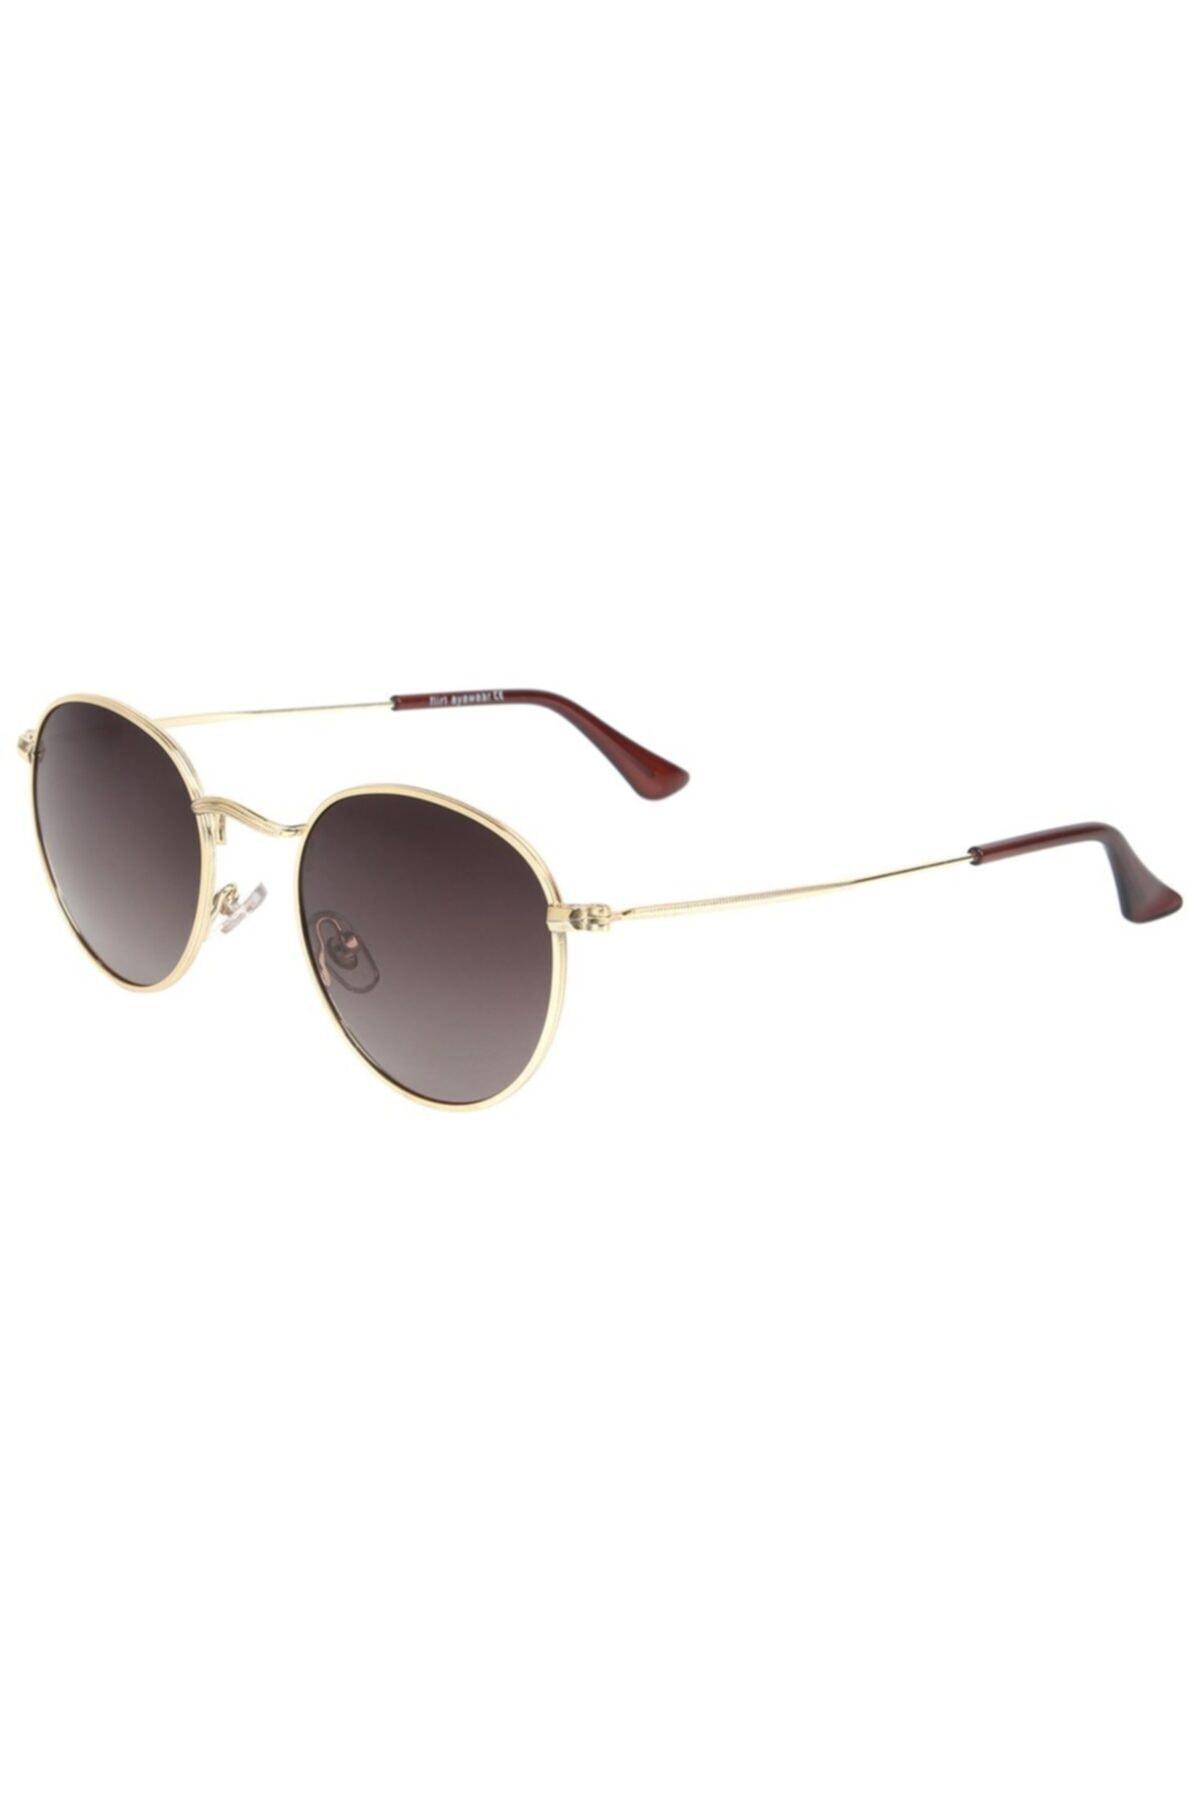 عینک آفتابی طرح دار برند Flirt رنگ زرد ty68136721